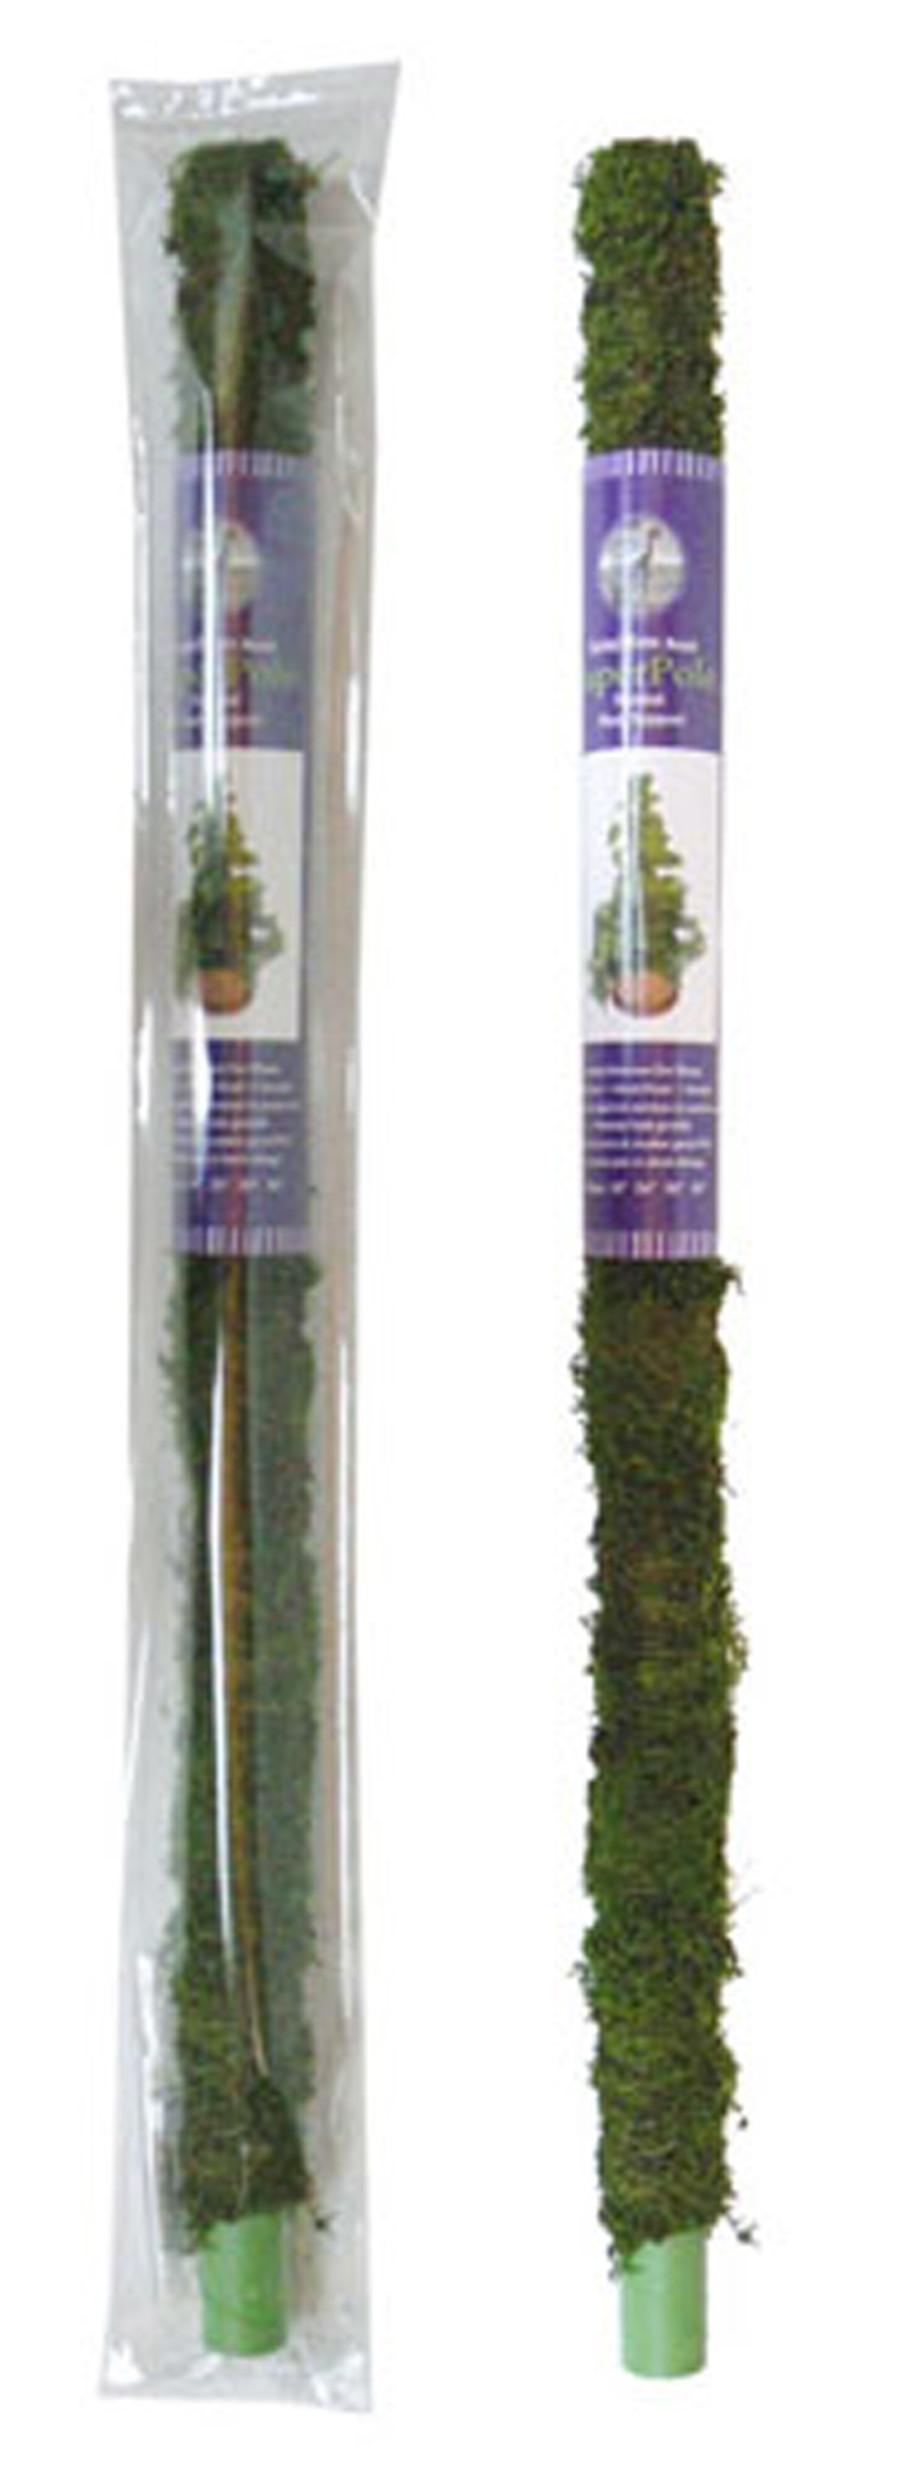 Supermoss Moss Poles Preserved